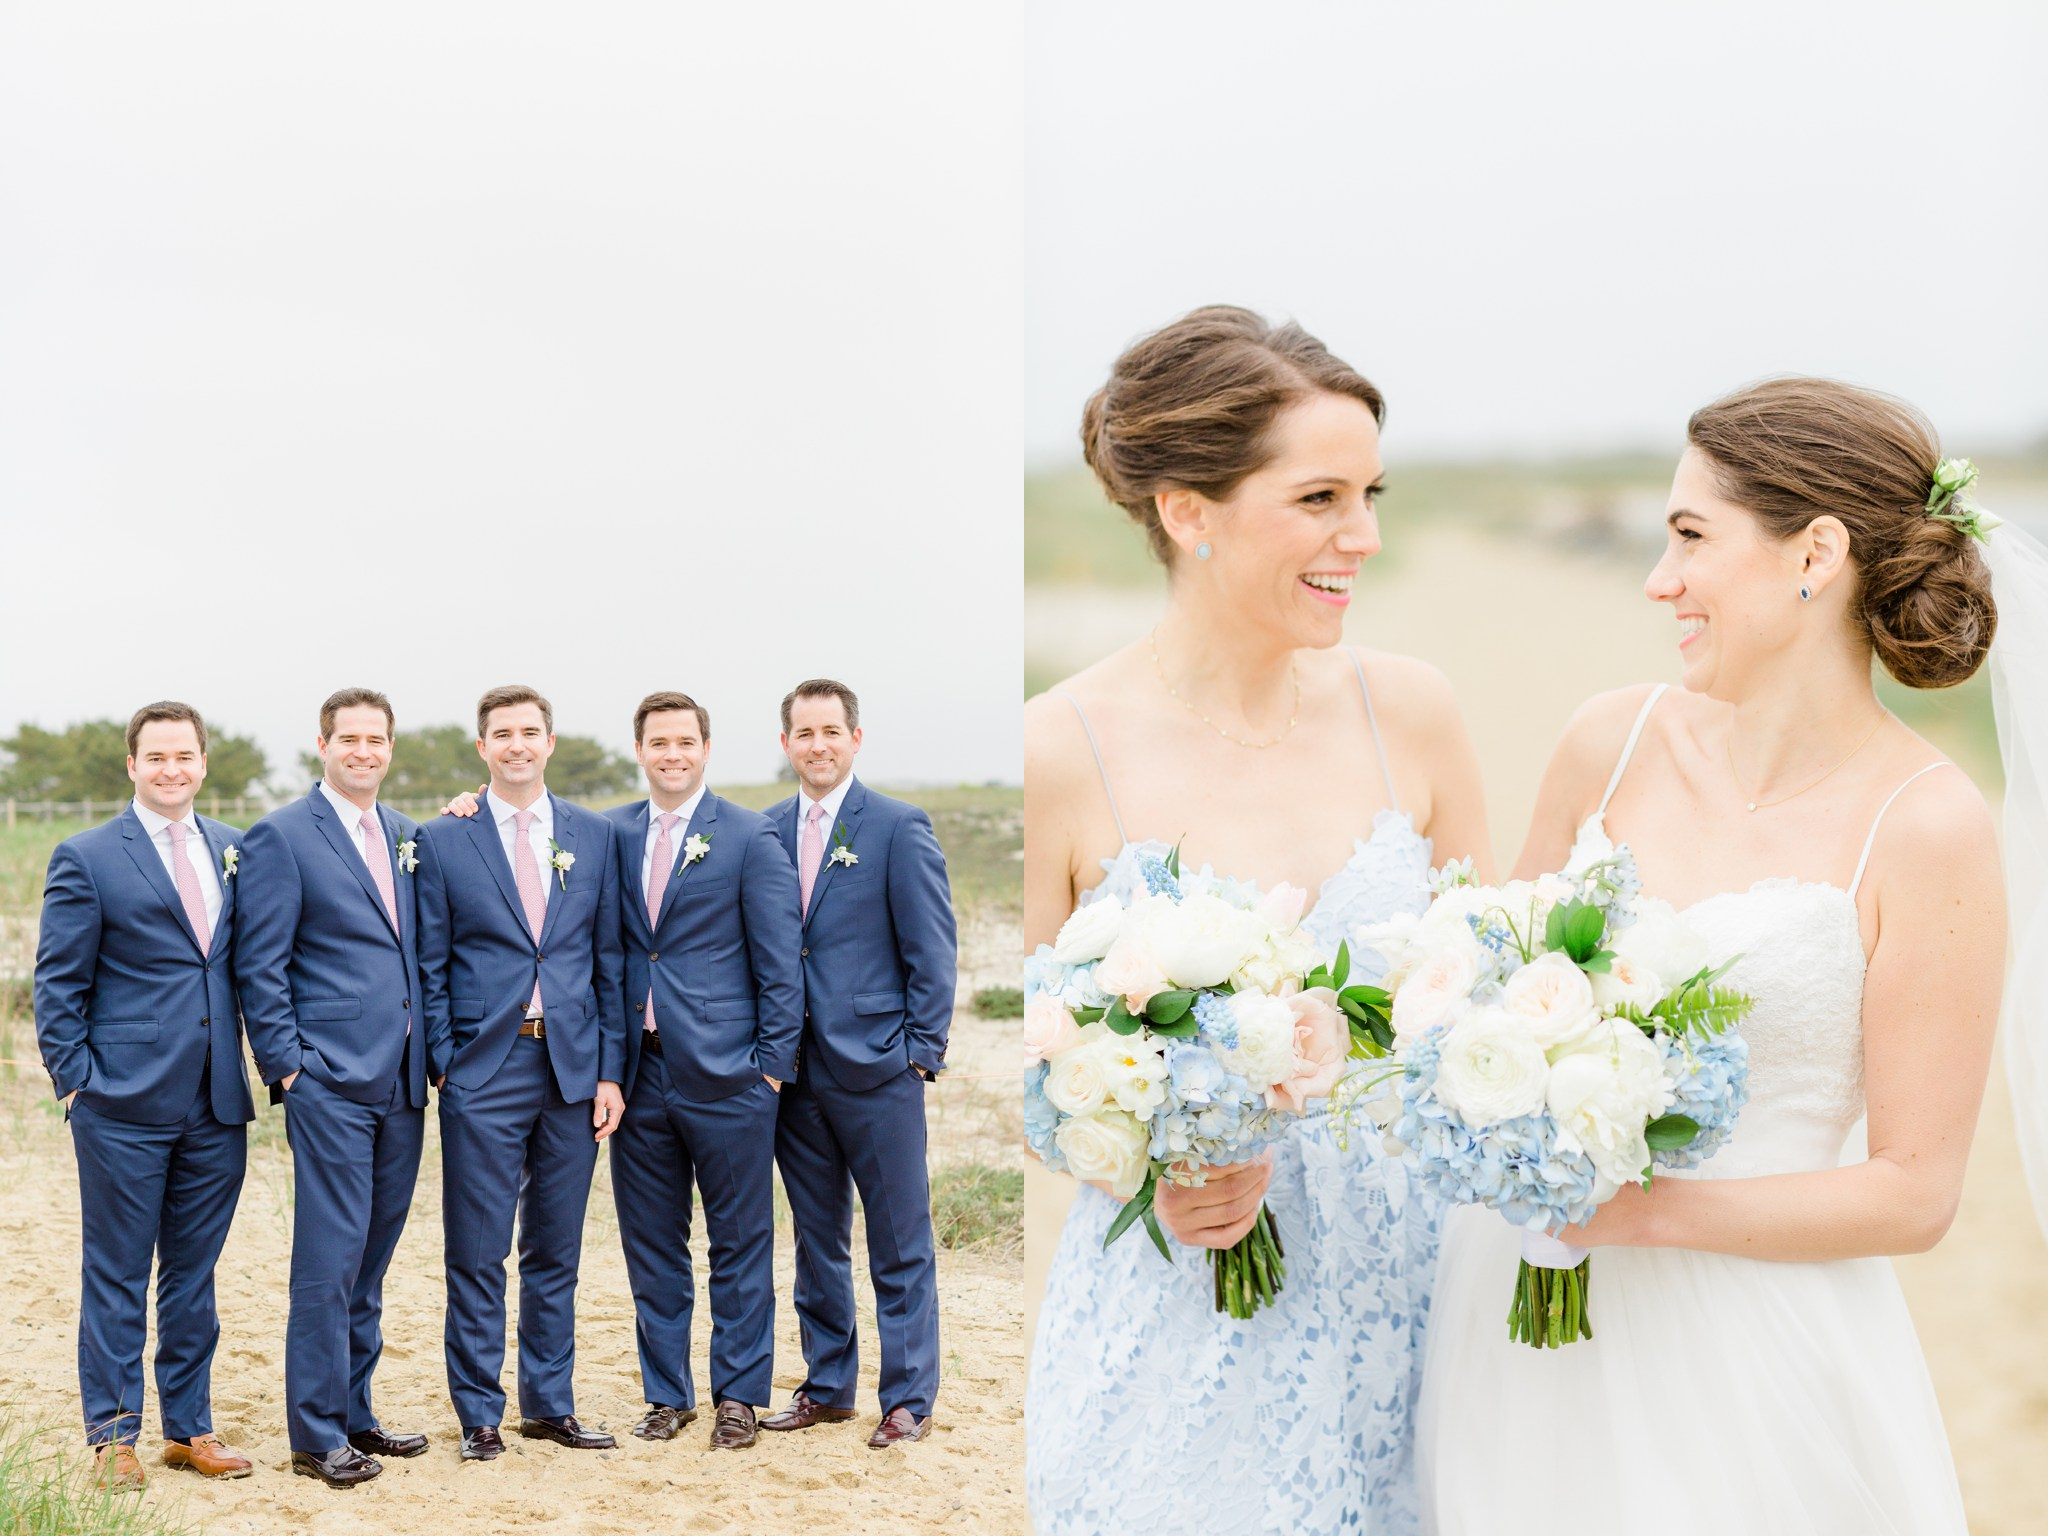 cape_cod_wedding_deborah_zoe_Photography_00045.JPG